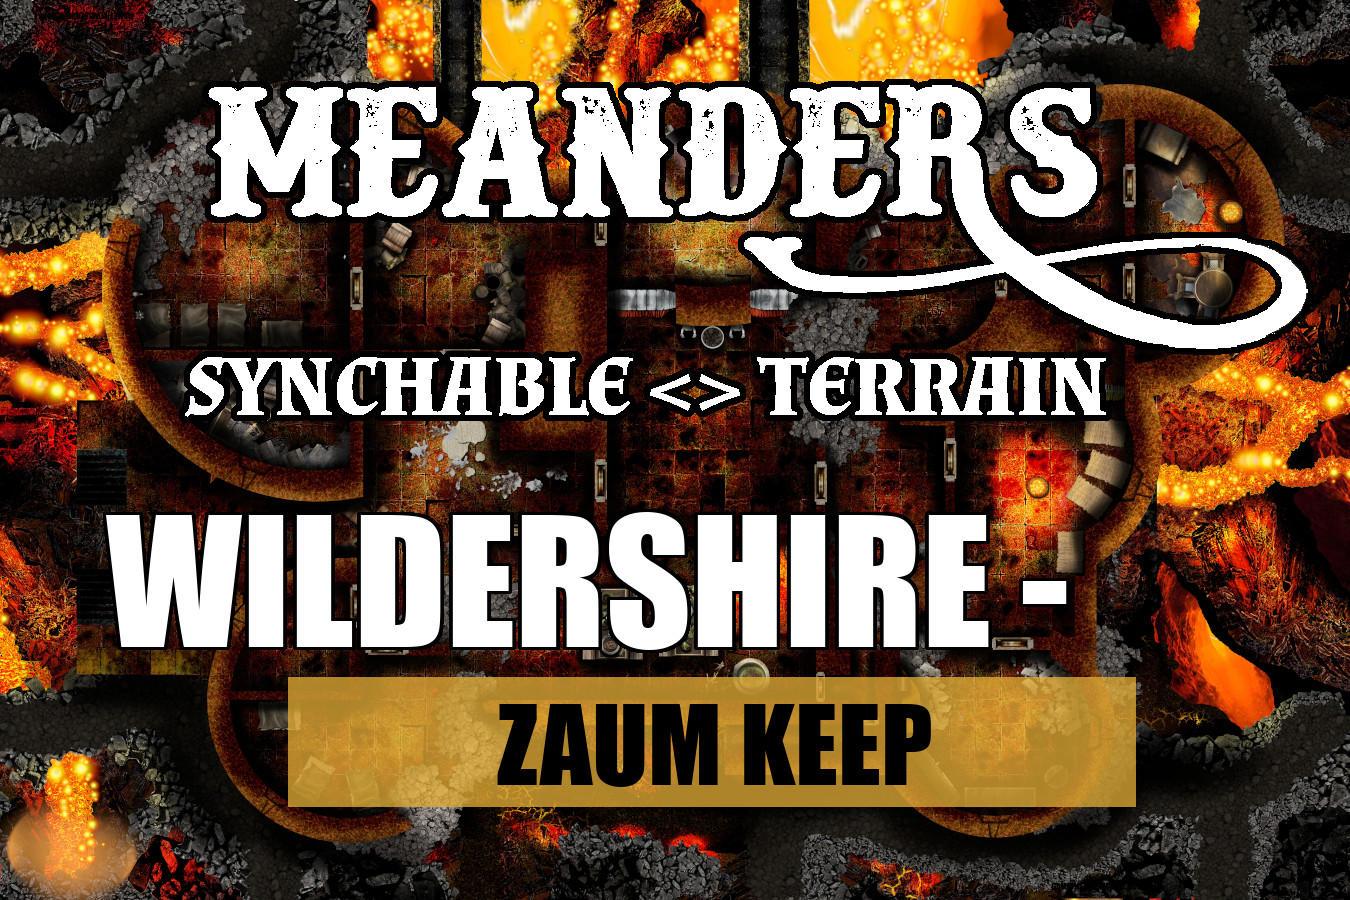 Wildershire 38 - Zaum Fyre Keep